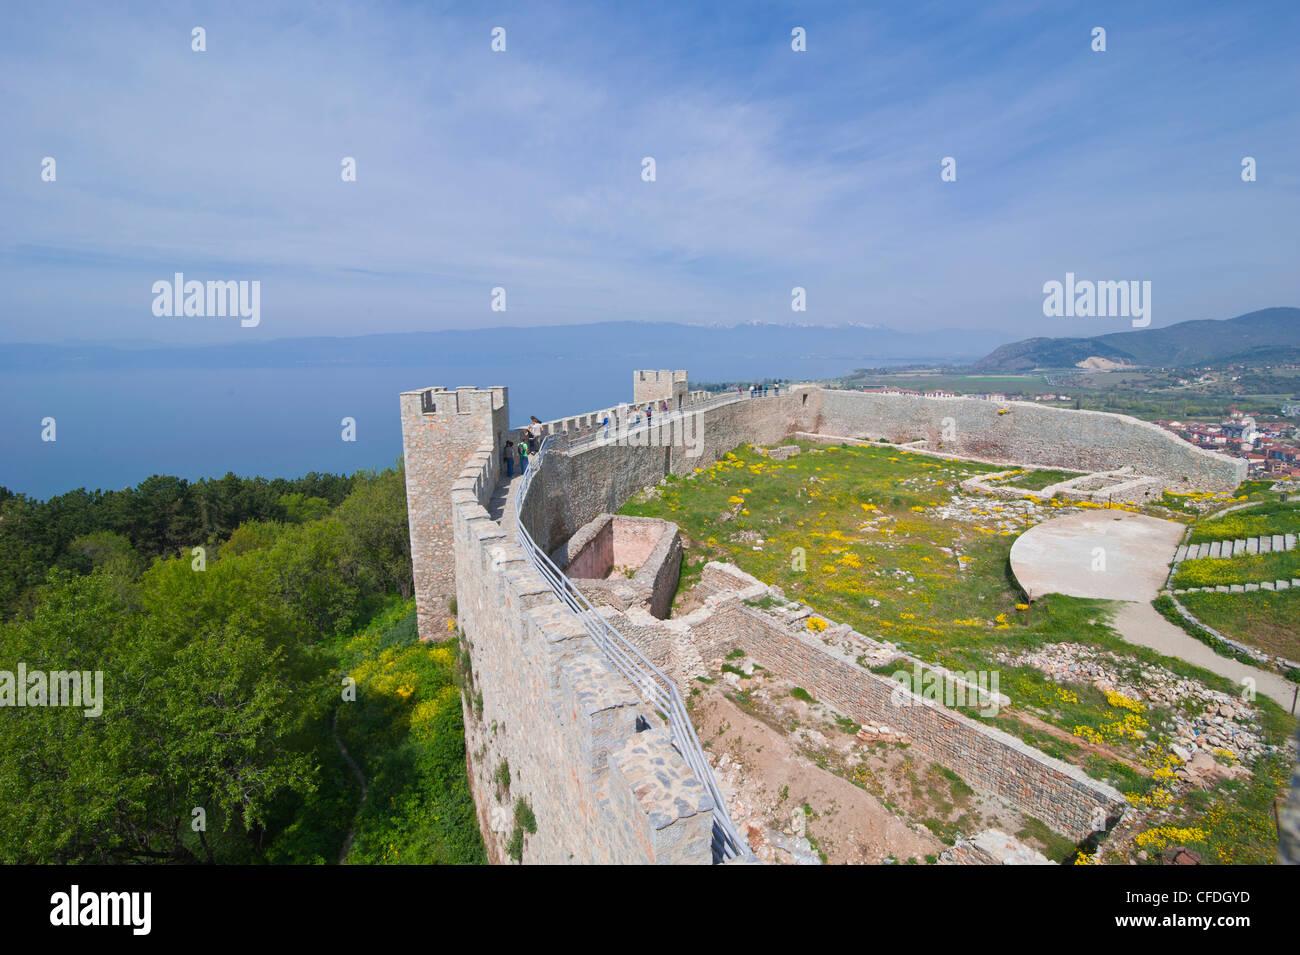 Castle, Ohrid at Lake Ohrid, UNESCO World Heritage Site, Macedonia, Europe Stock Photo